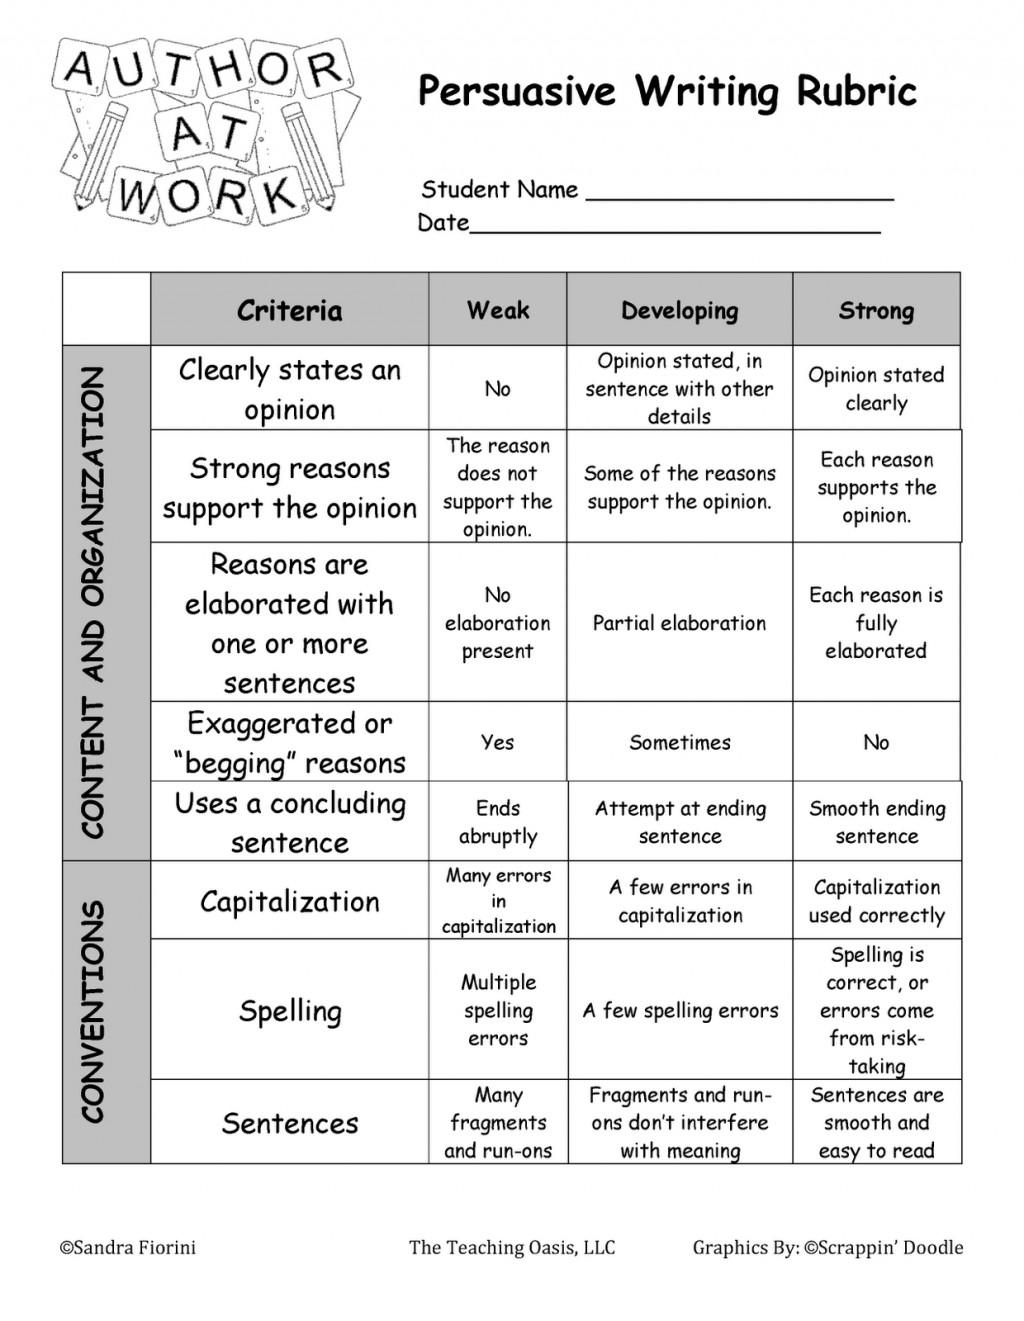 009 Argumentative Essay Rubric Example Persuasive Writing Unit Fiorini Oasis Page 22 Surprising Grade 7 10th Large